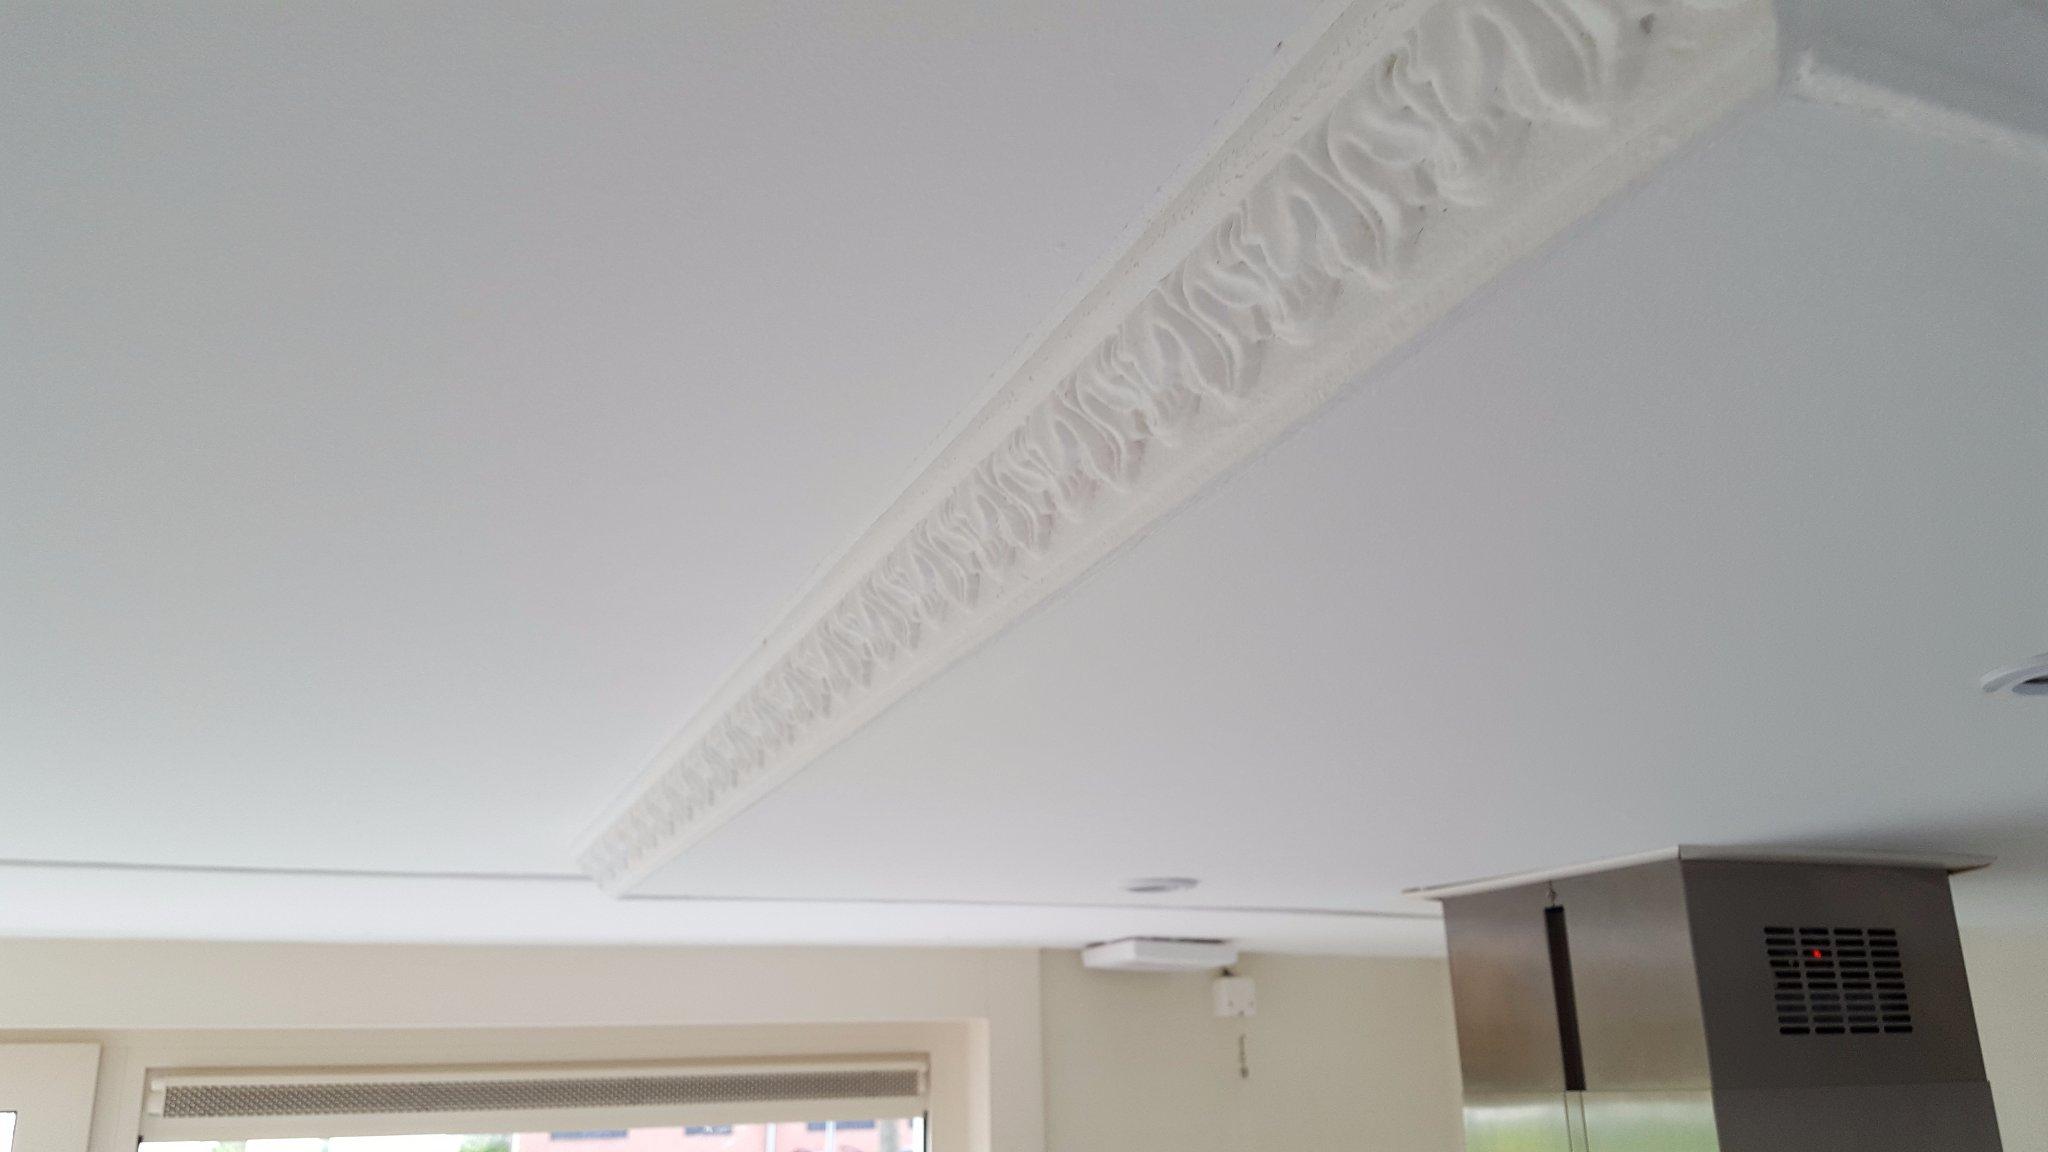 Plafond decoratie piepschuim vb64 aboriginaltourismontario for Plafond sierlijst